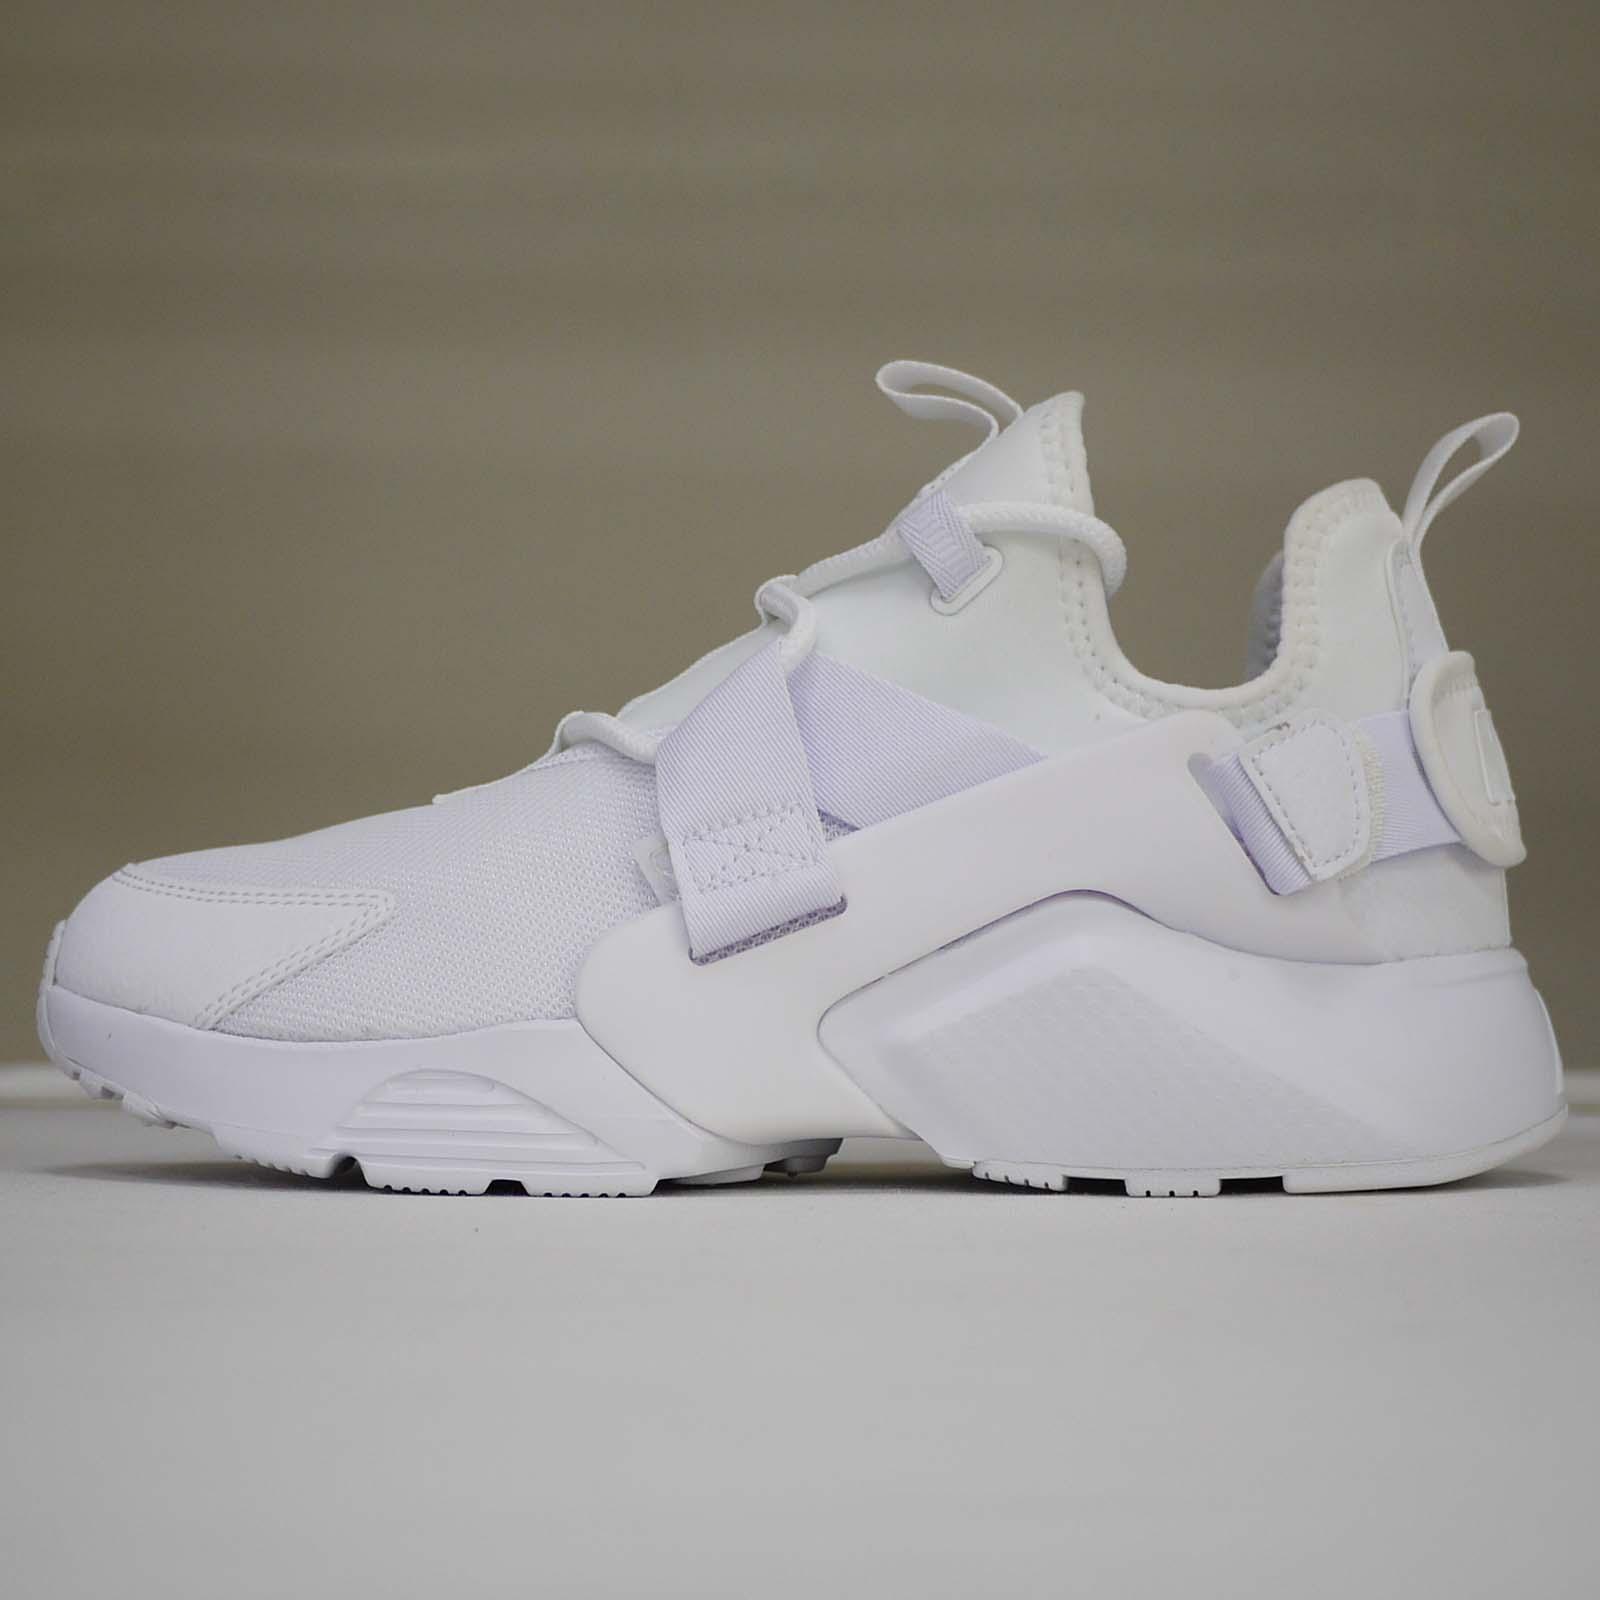 9dc38e0a5781a Nike Wmns Air Huarache City Low Womens Shoes different Size US 9   8  AH6804-100